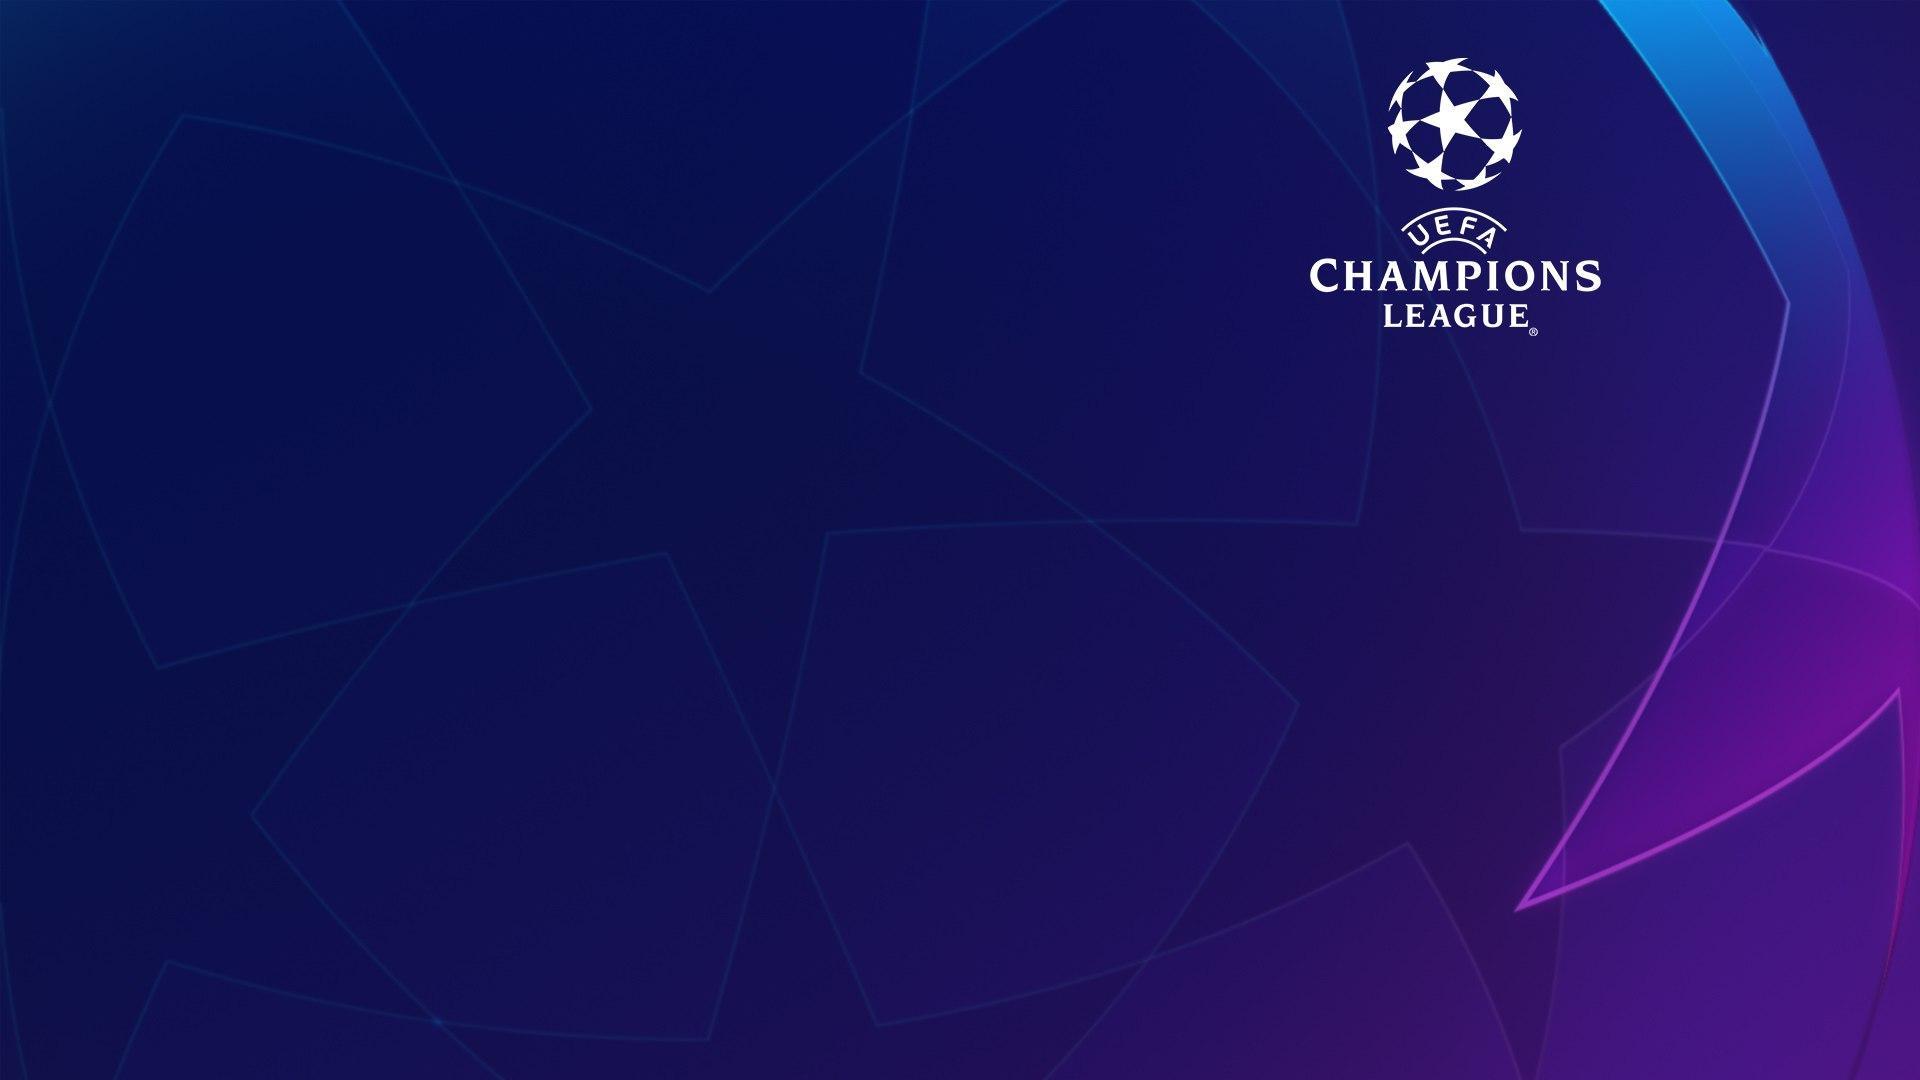 Sky Sport Uno HD 5 x 5 Champions League